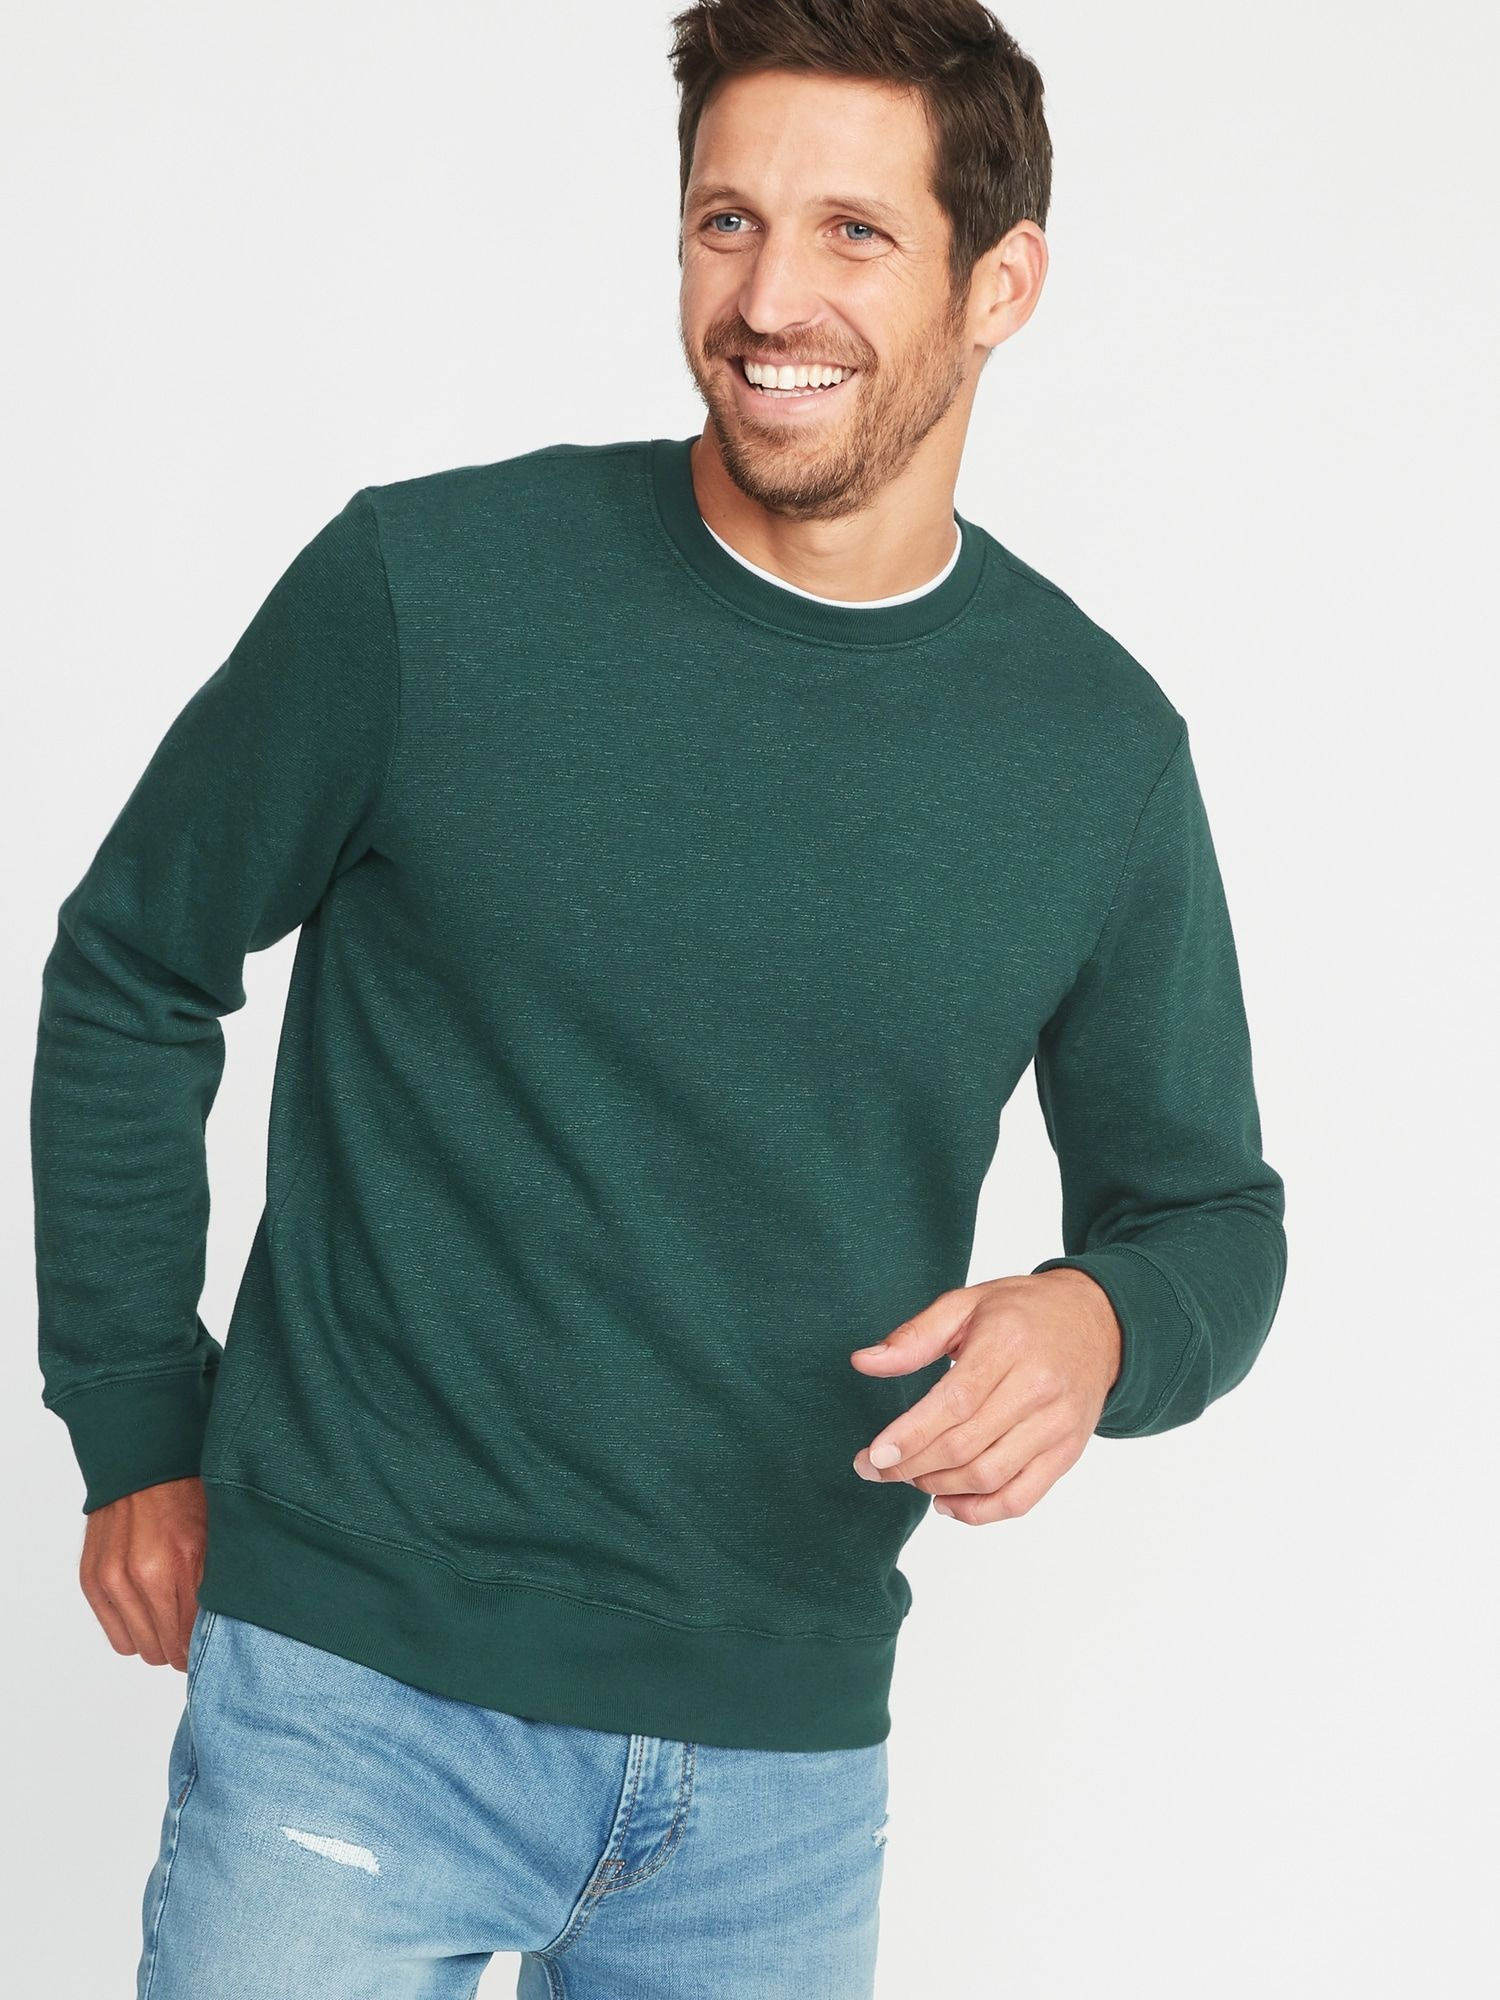 Classic Crew Neck Sweatshirt For Men Old Navy Hoodie Design Mens Fashion Wear Men Sweater [ 2000 x 1500 Pixel ]